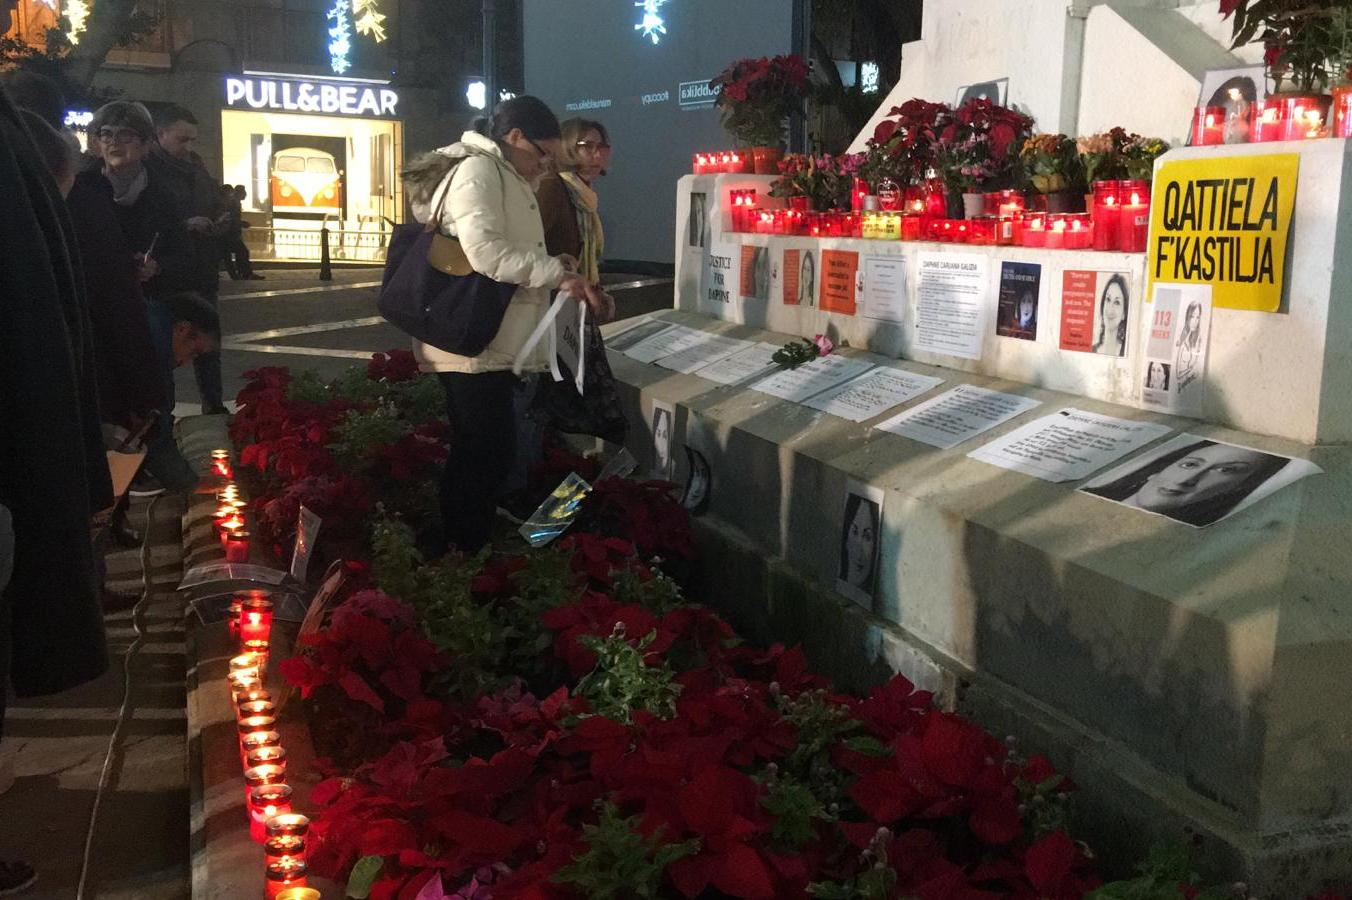 Activists pay tribute to Daphne Caruana Galizia in Valletta.